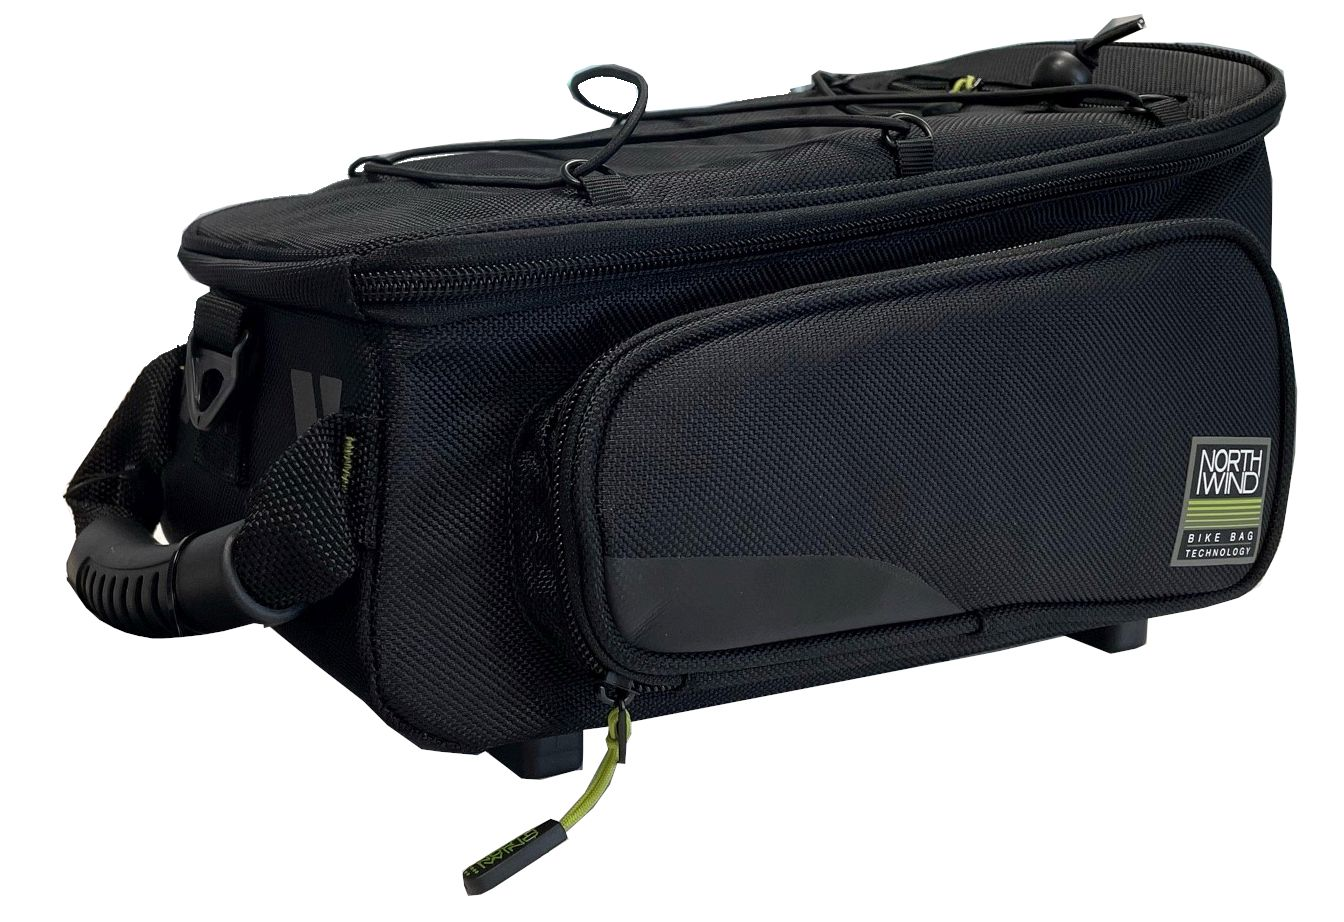 Northwind Gepäckträgertasche Smartbag Classic für i-Rack II